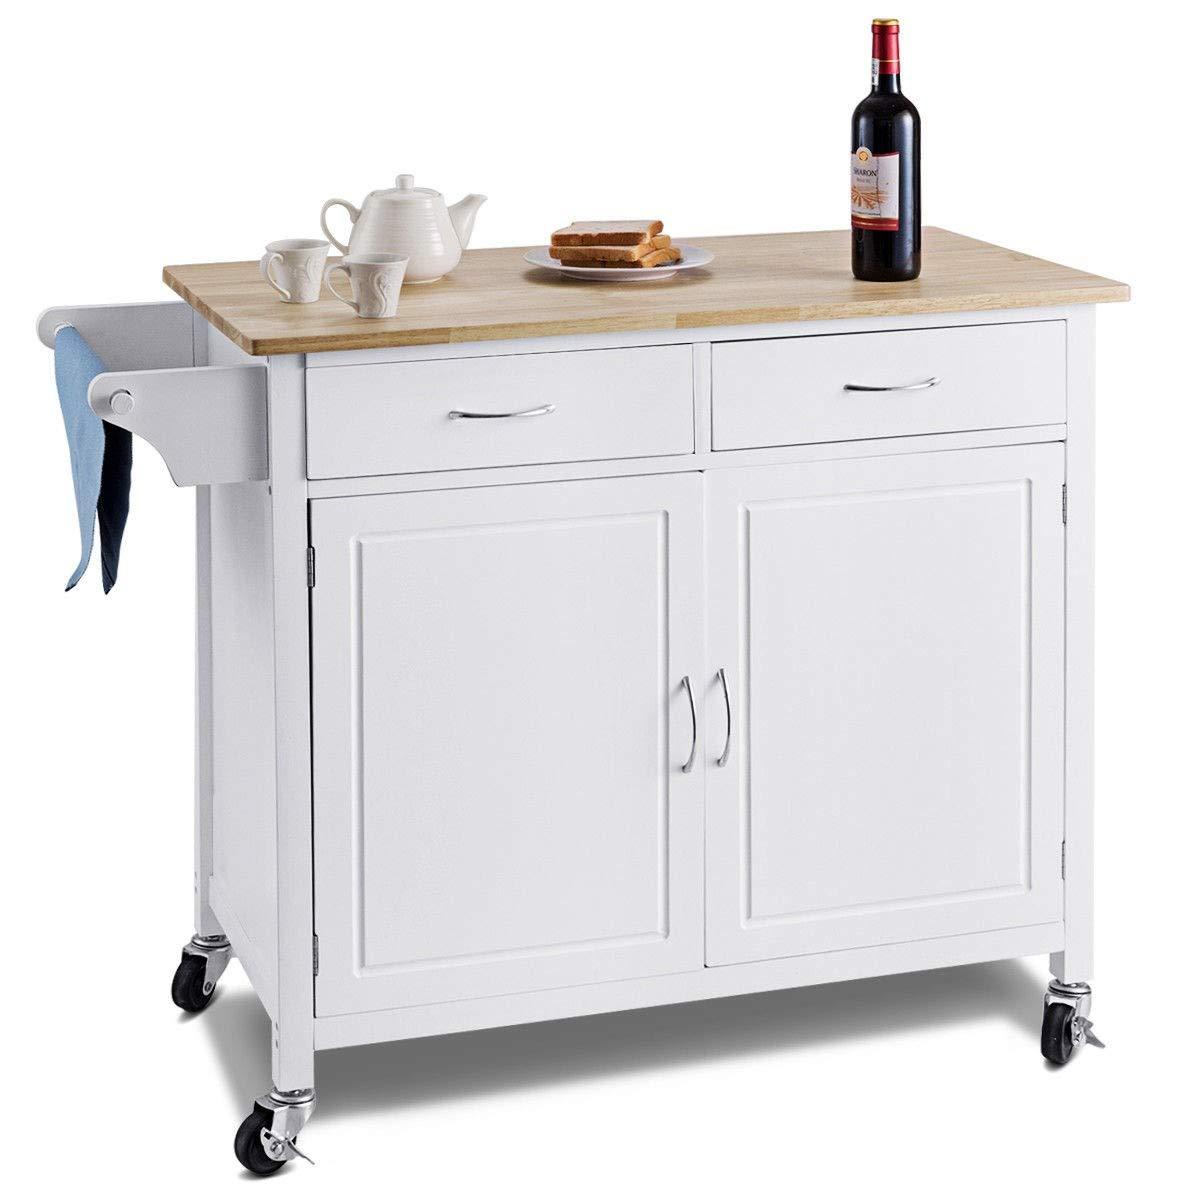 WATERJOY Rolling Kitchen Buffet Cart, Wood Utility Kitchen Storage Island Cart with Wood Top, Antique White(43' x 19.5' x 35.5') Antique White(43 x 19.5 x 35.5) 59426